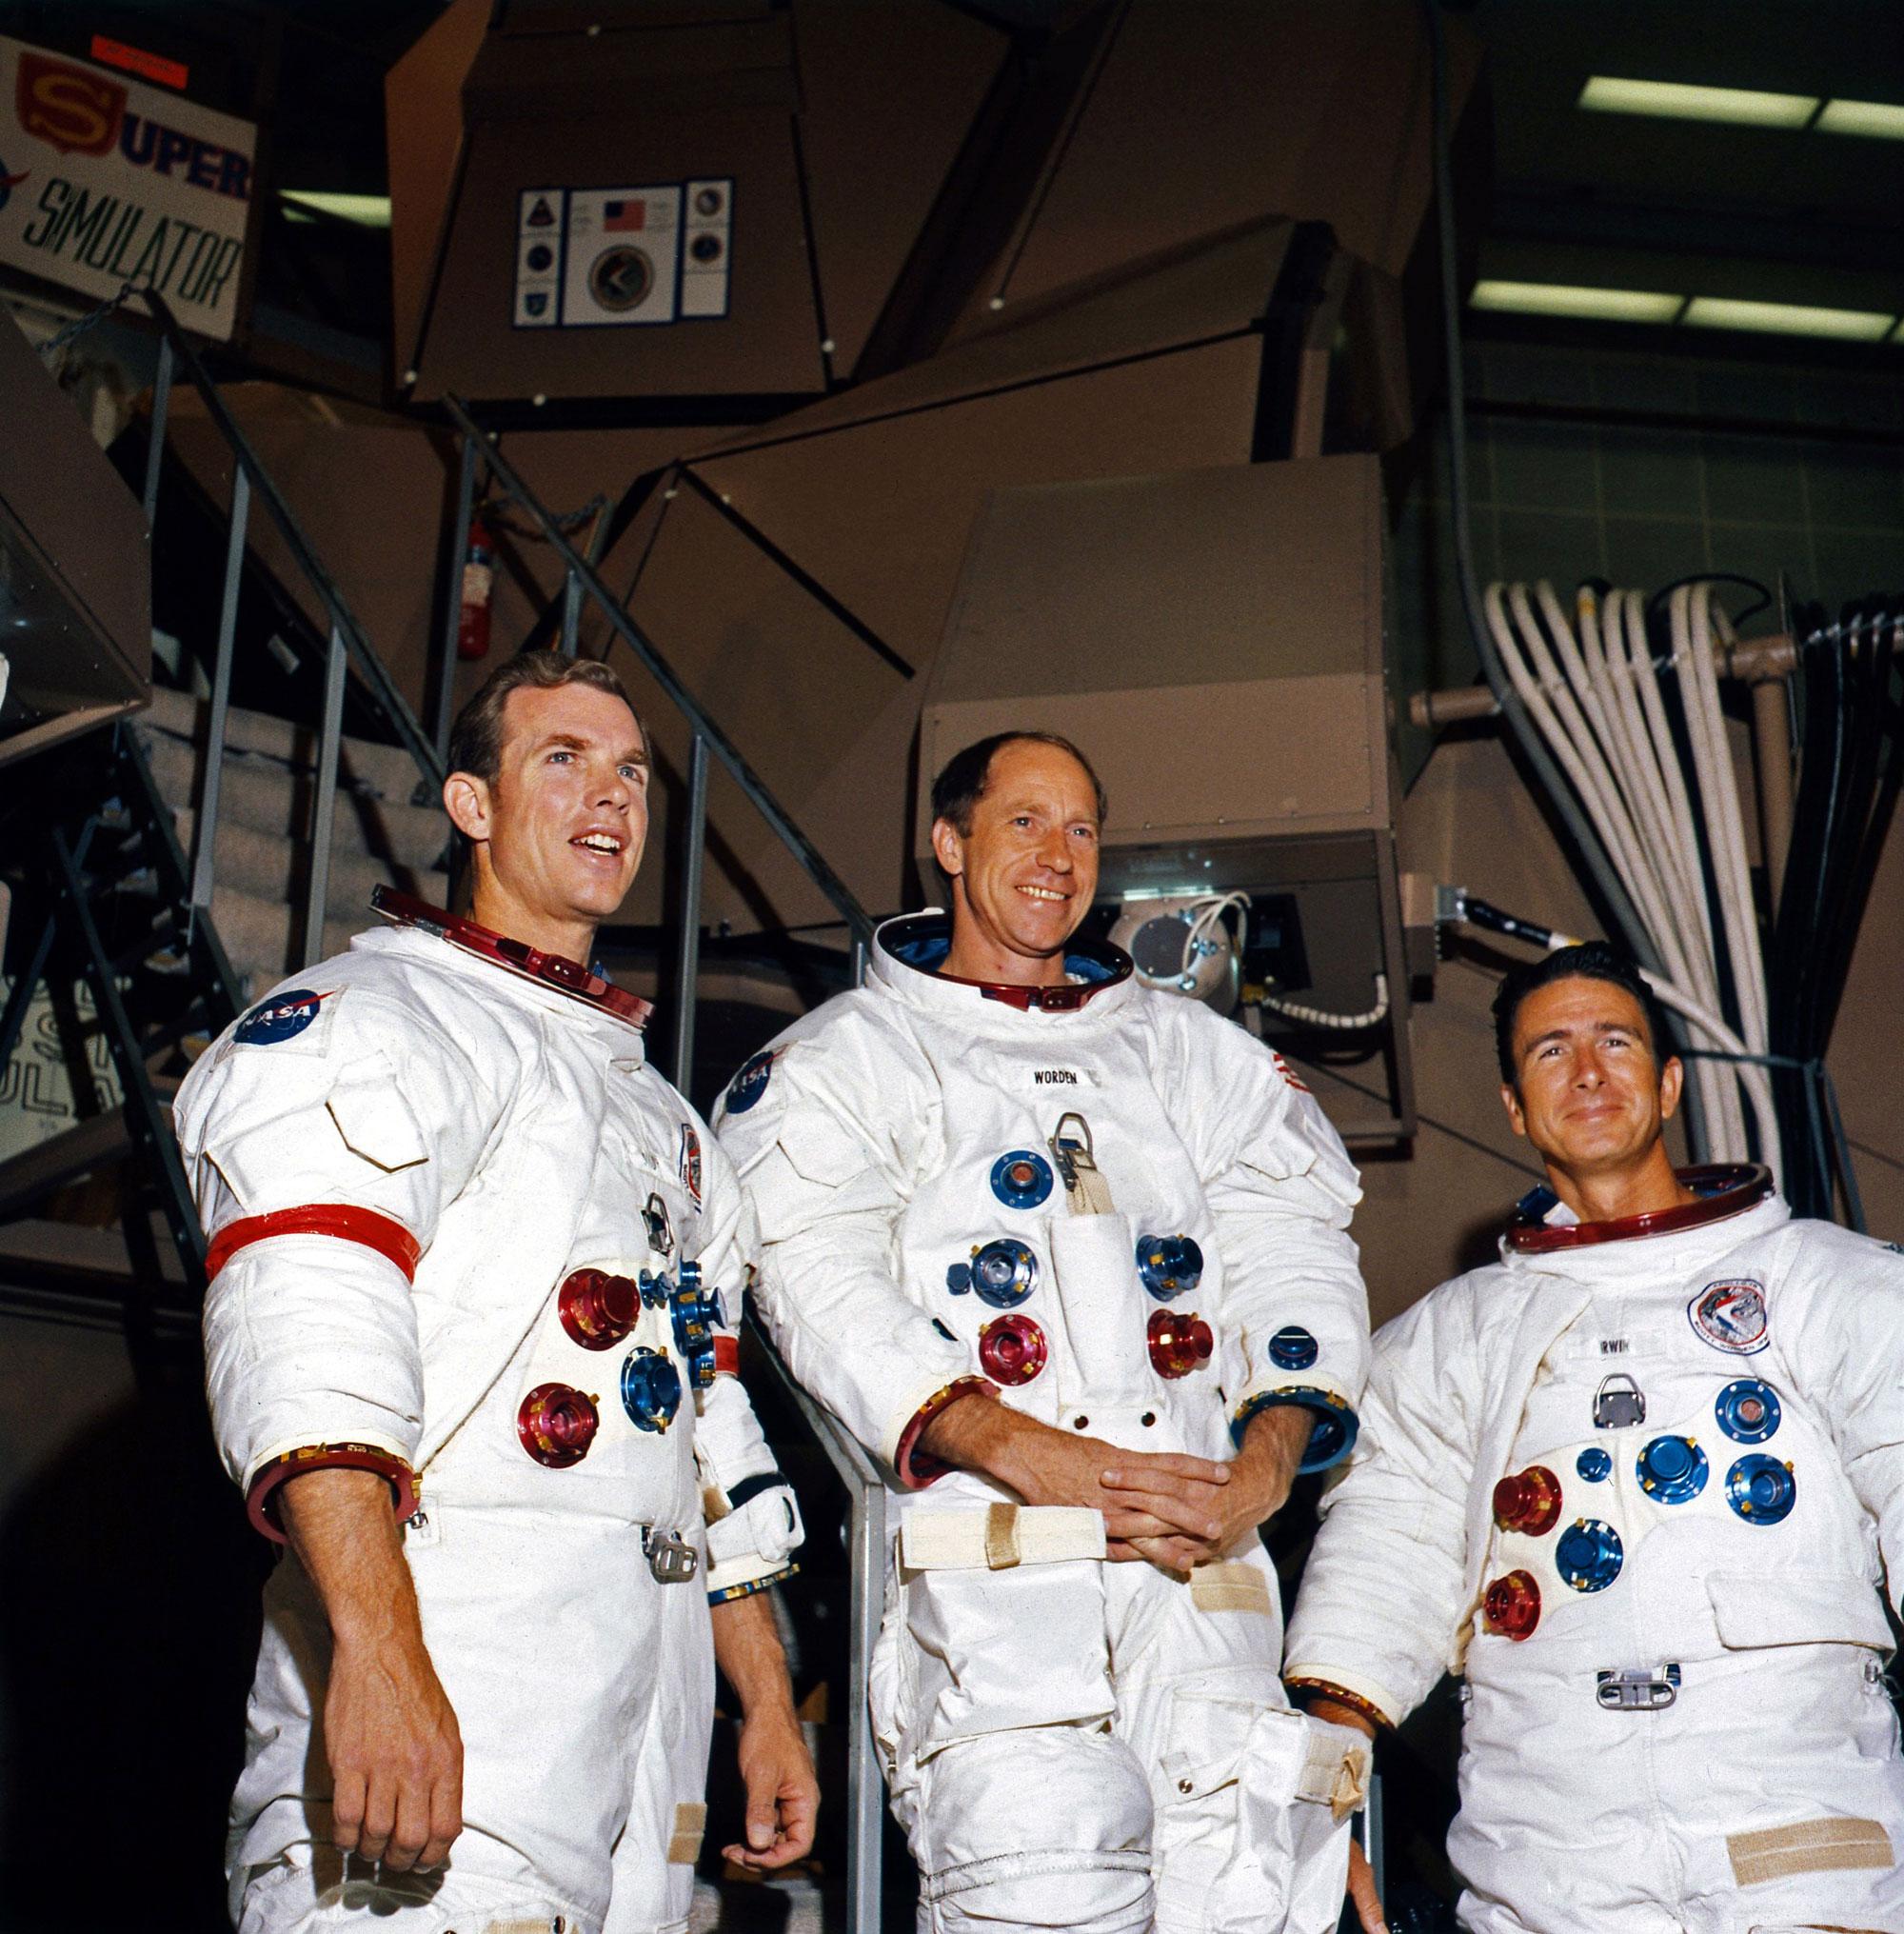 Apollo 15 crew Dave Scott, Al Worden and Jim Irwin. Credit: NASA via Retro Space Images